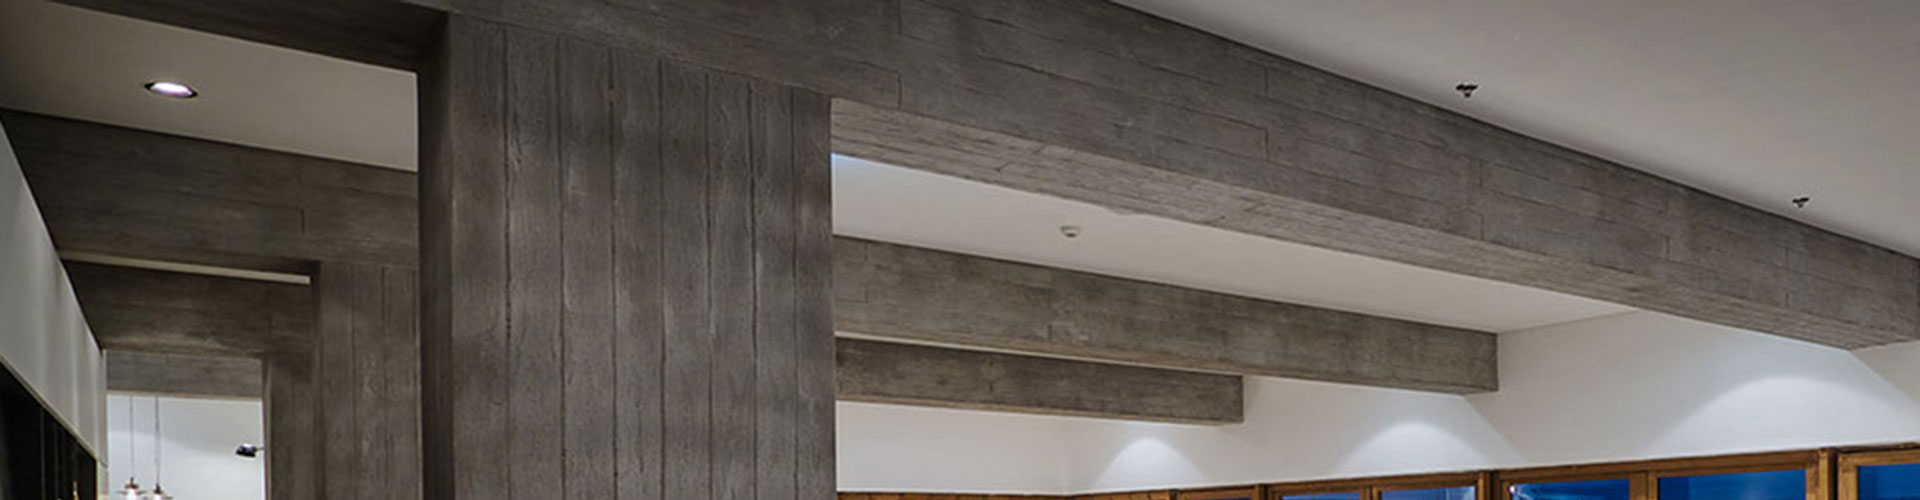 Concrete-wall-by-BETONADA